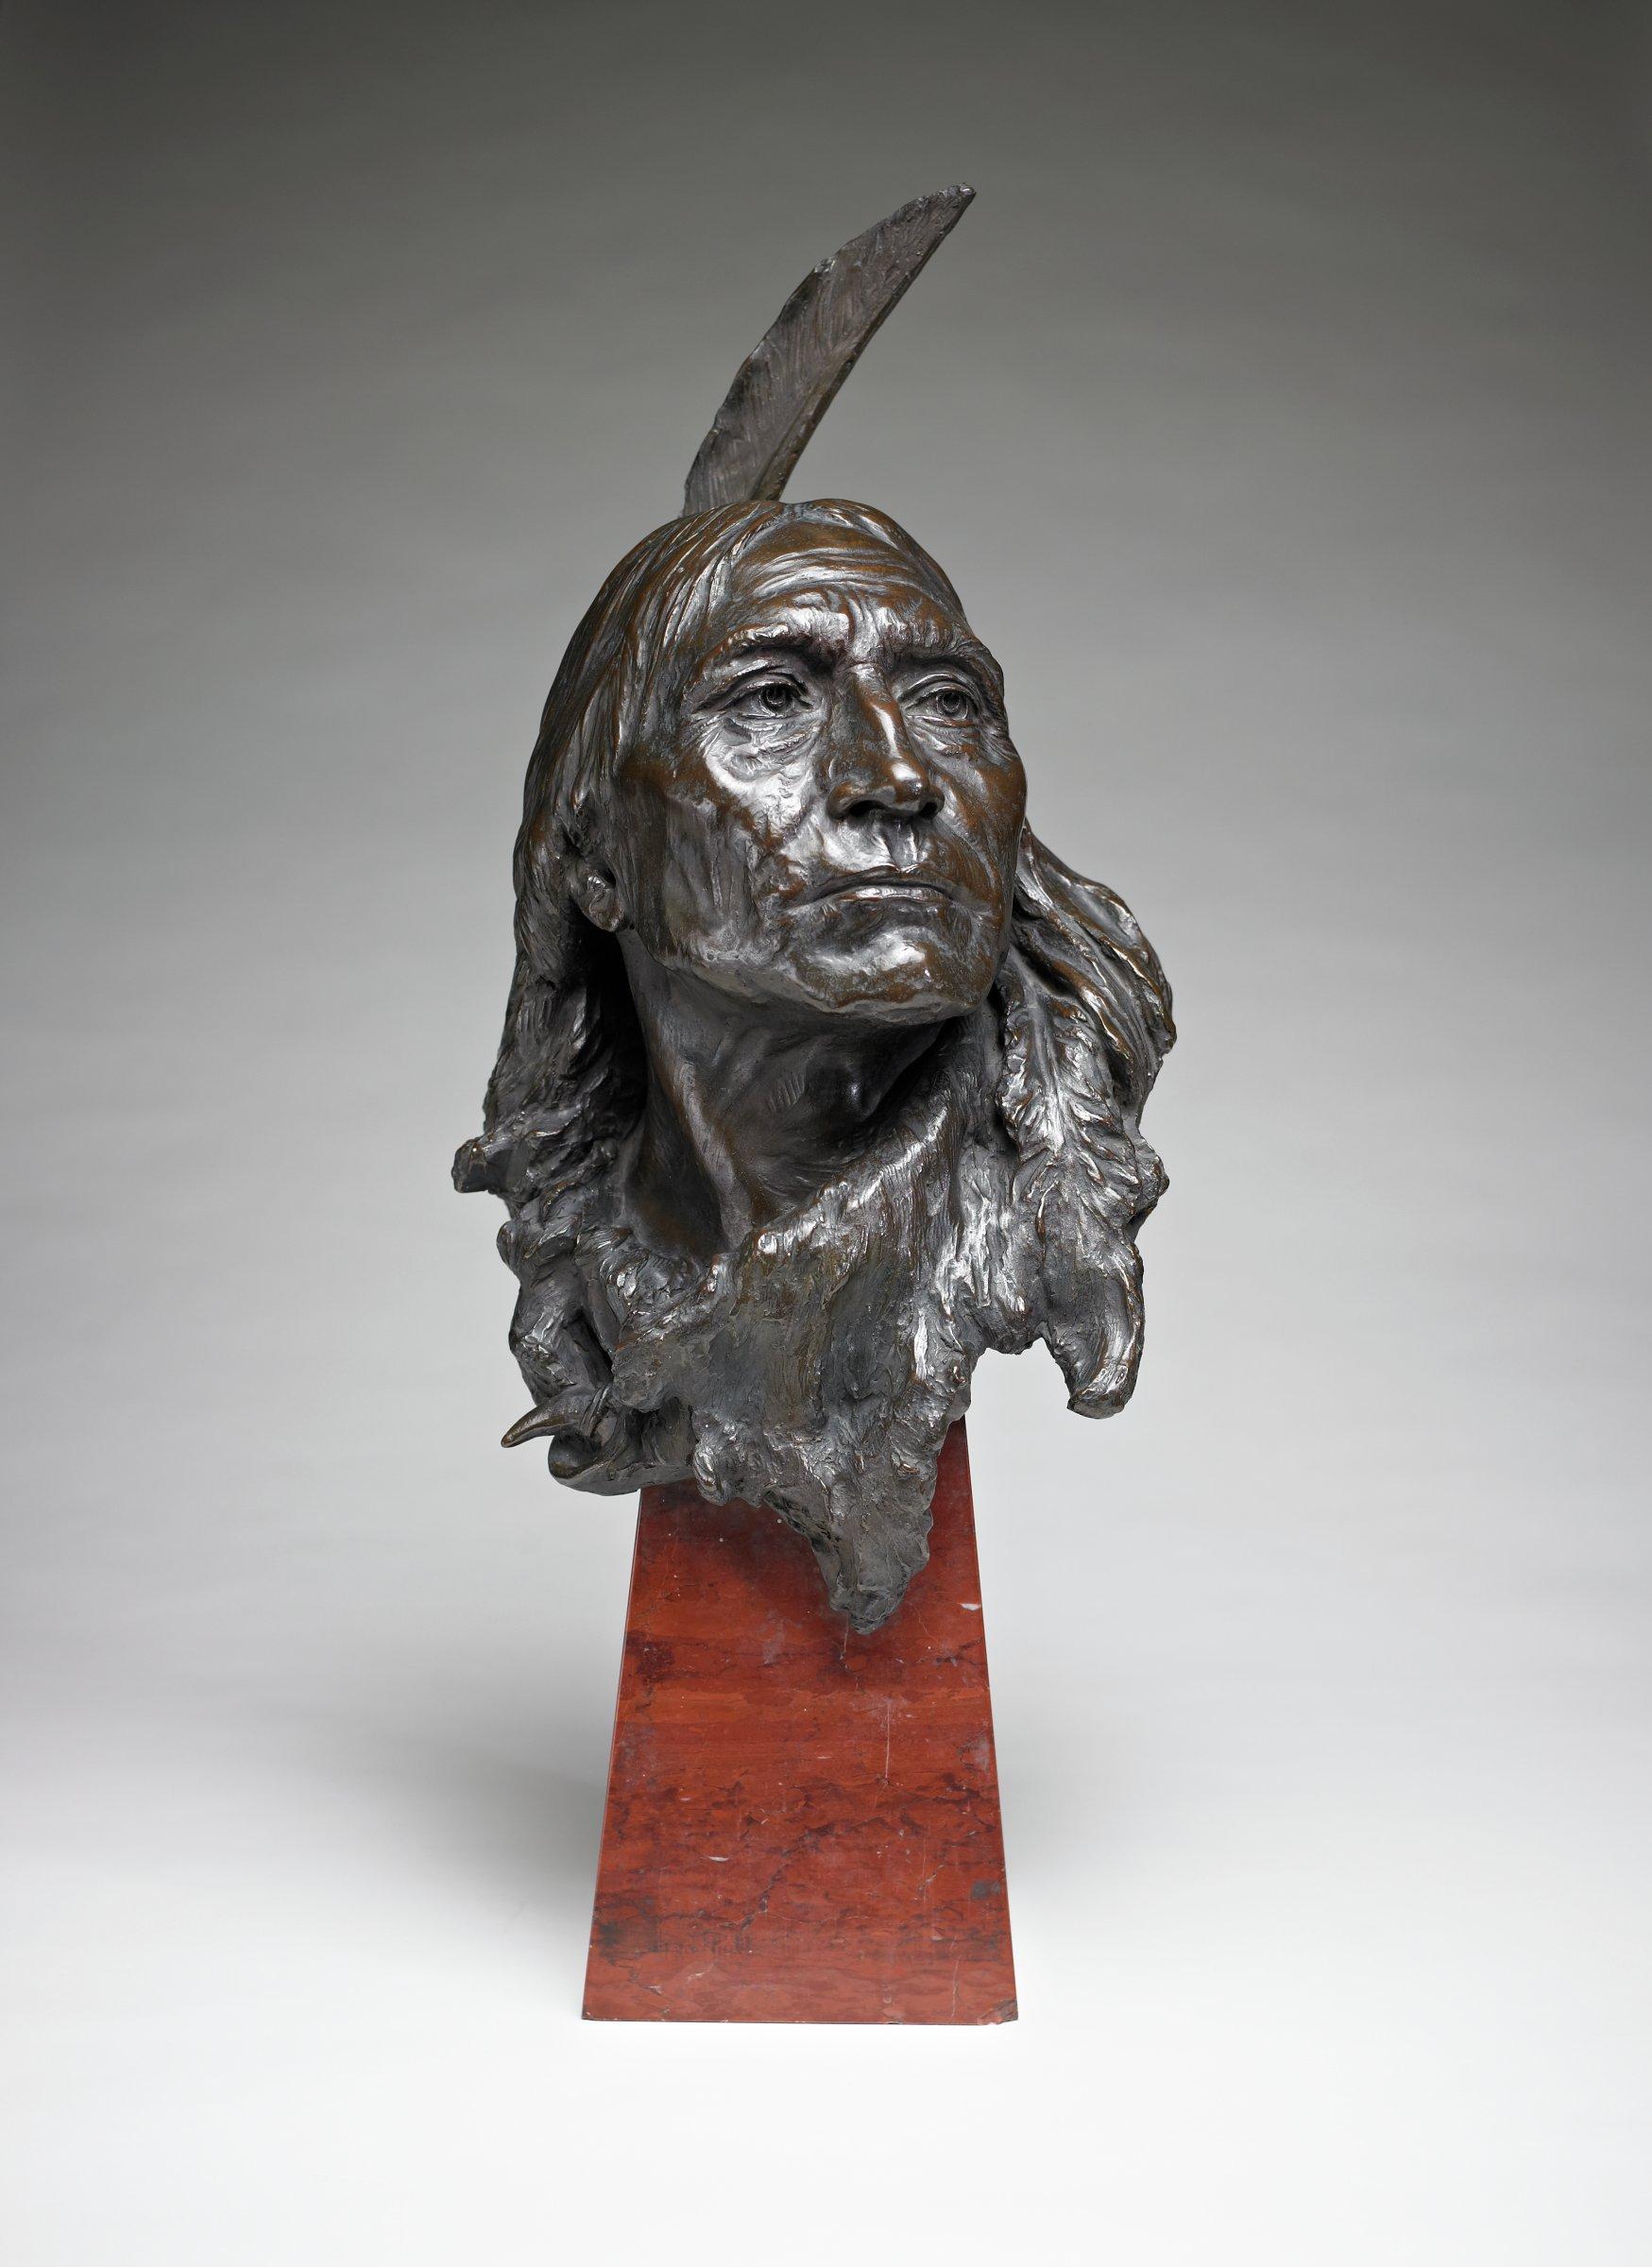 Indian Head, Giuseppe Moretti, bronze